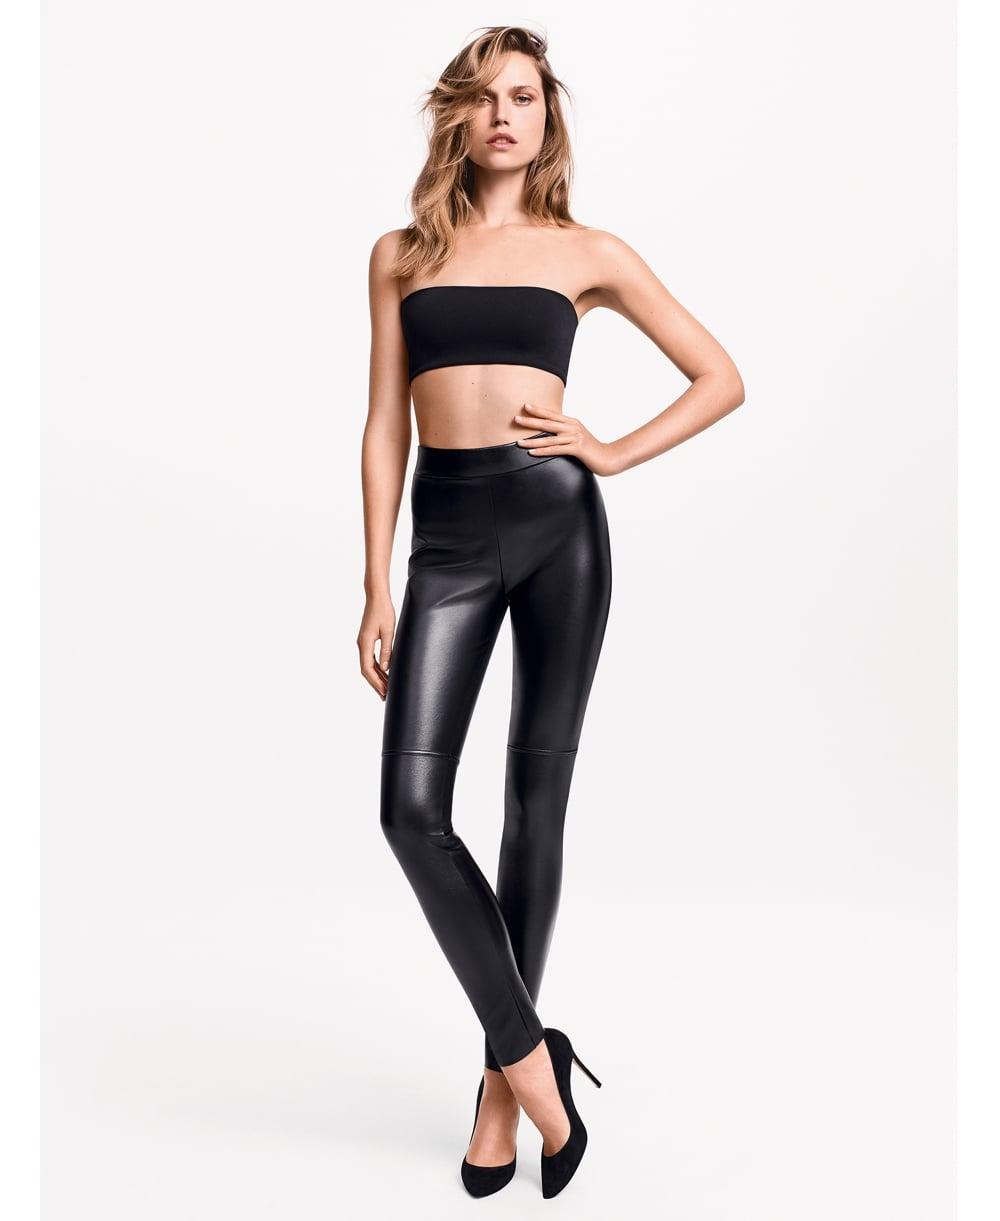 620579e4514f4 Wolford Estella Leather Look Leggings - Leggings from luxury-legs.com UK